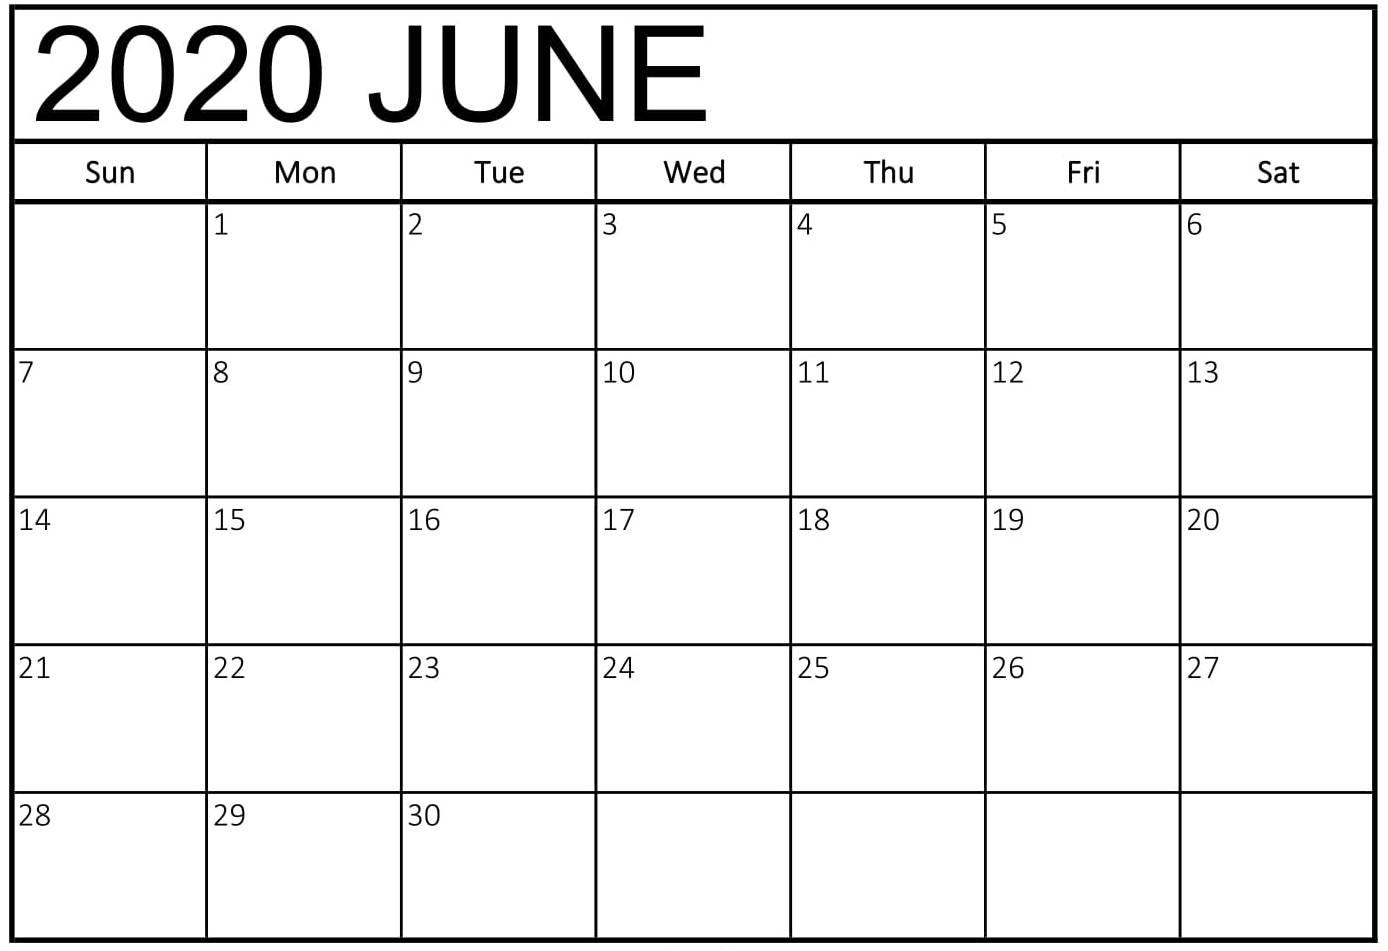 Online June 2020 Printable Calendar Free